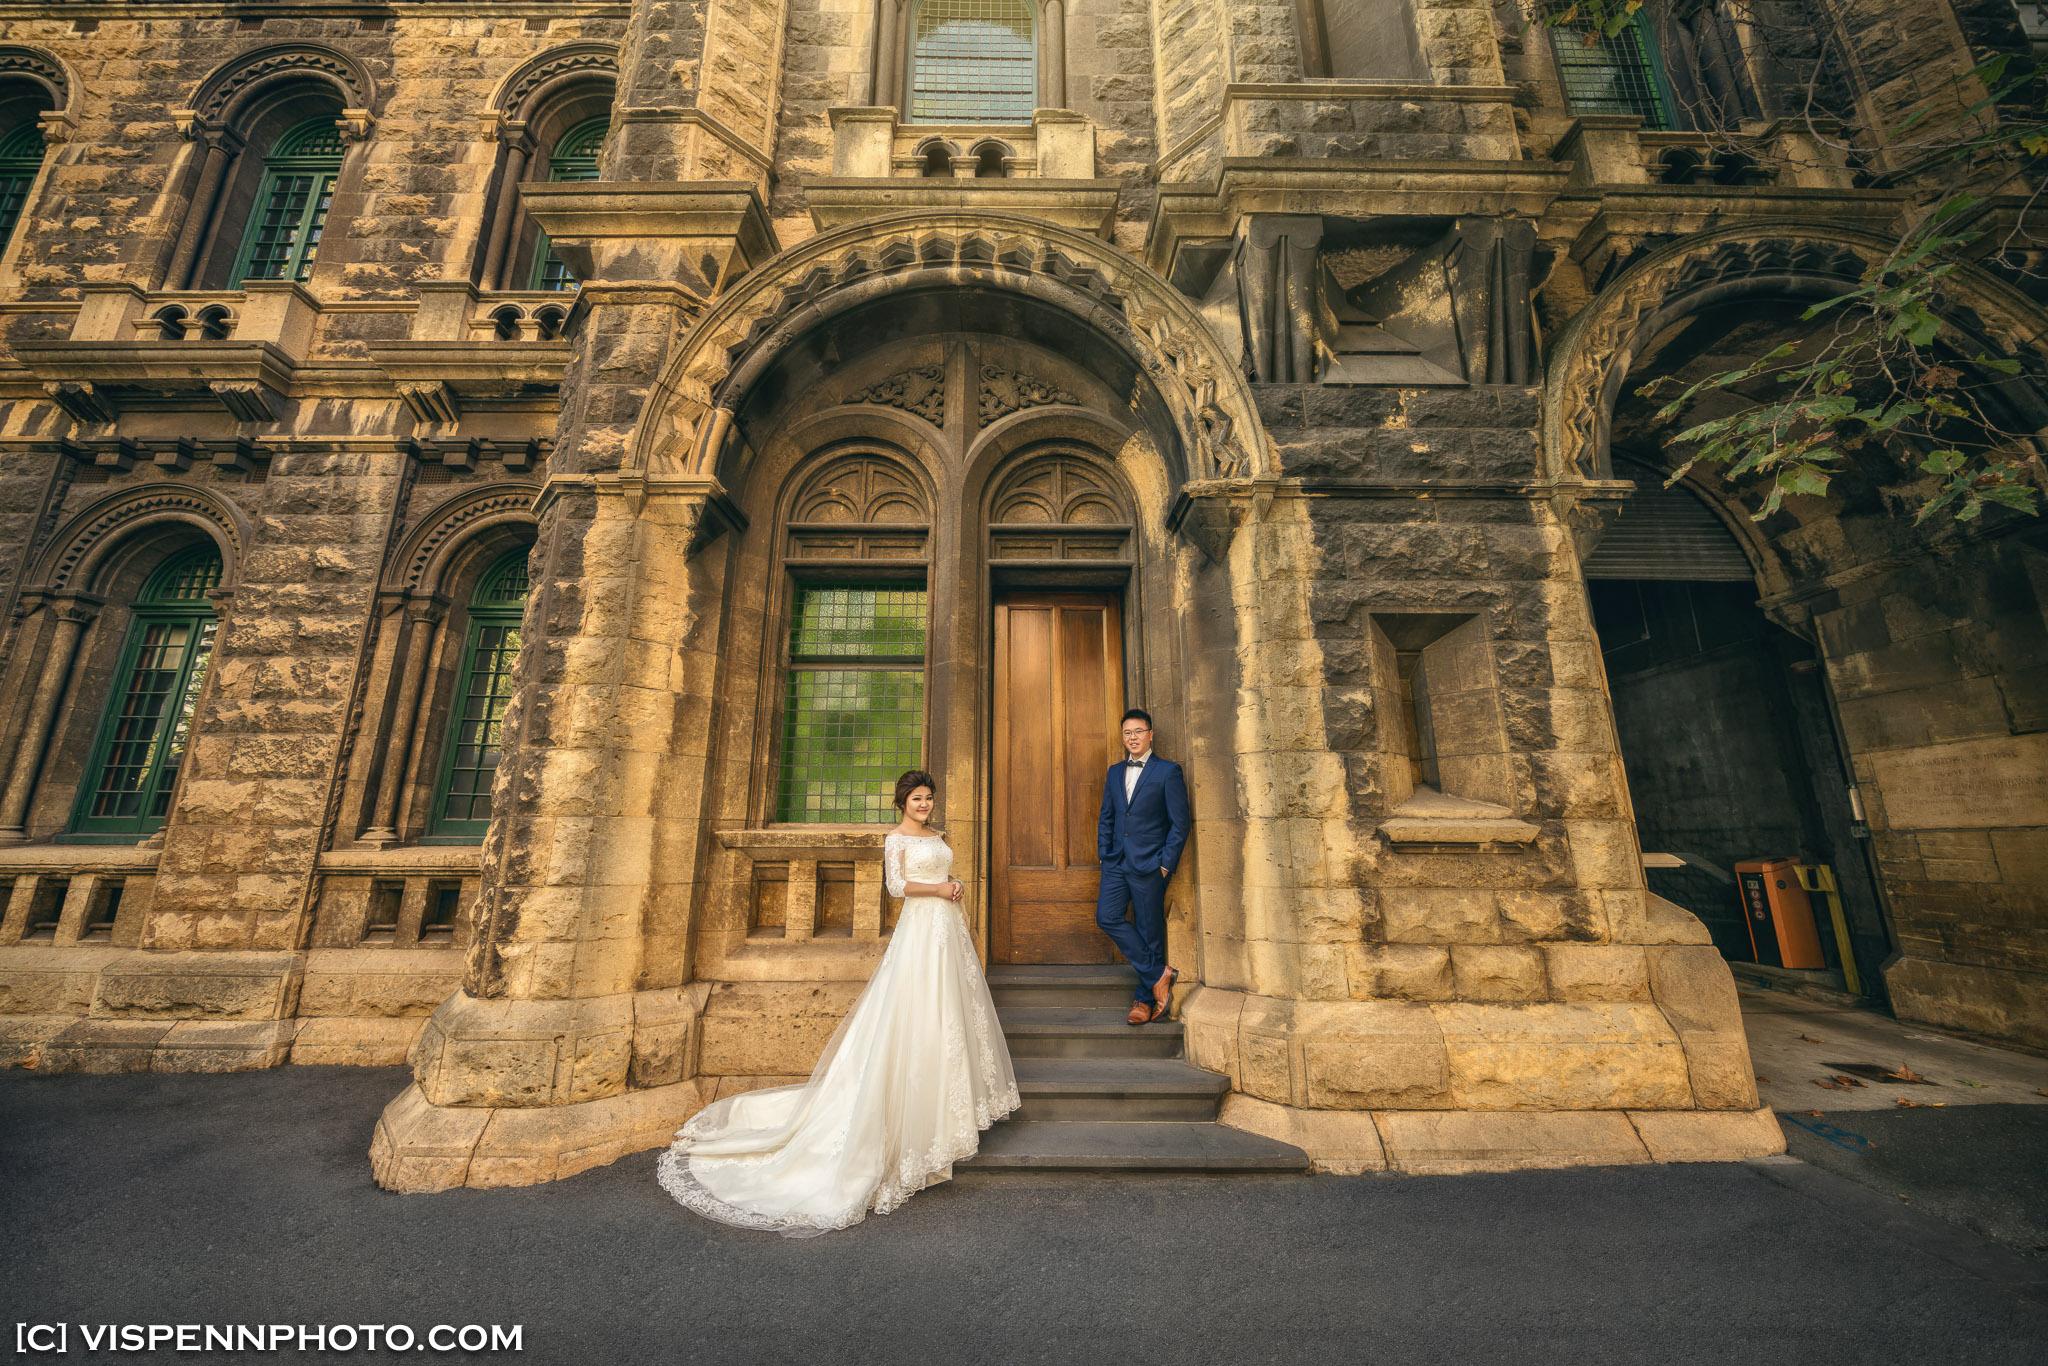 PRE WEDDING Photography Melbourne VISPENN 墨尔本 婚纱照 结婚照 婚纱摄影 VISPENN AthenaXiao 0612 copy